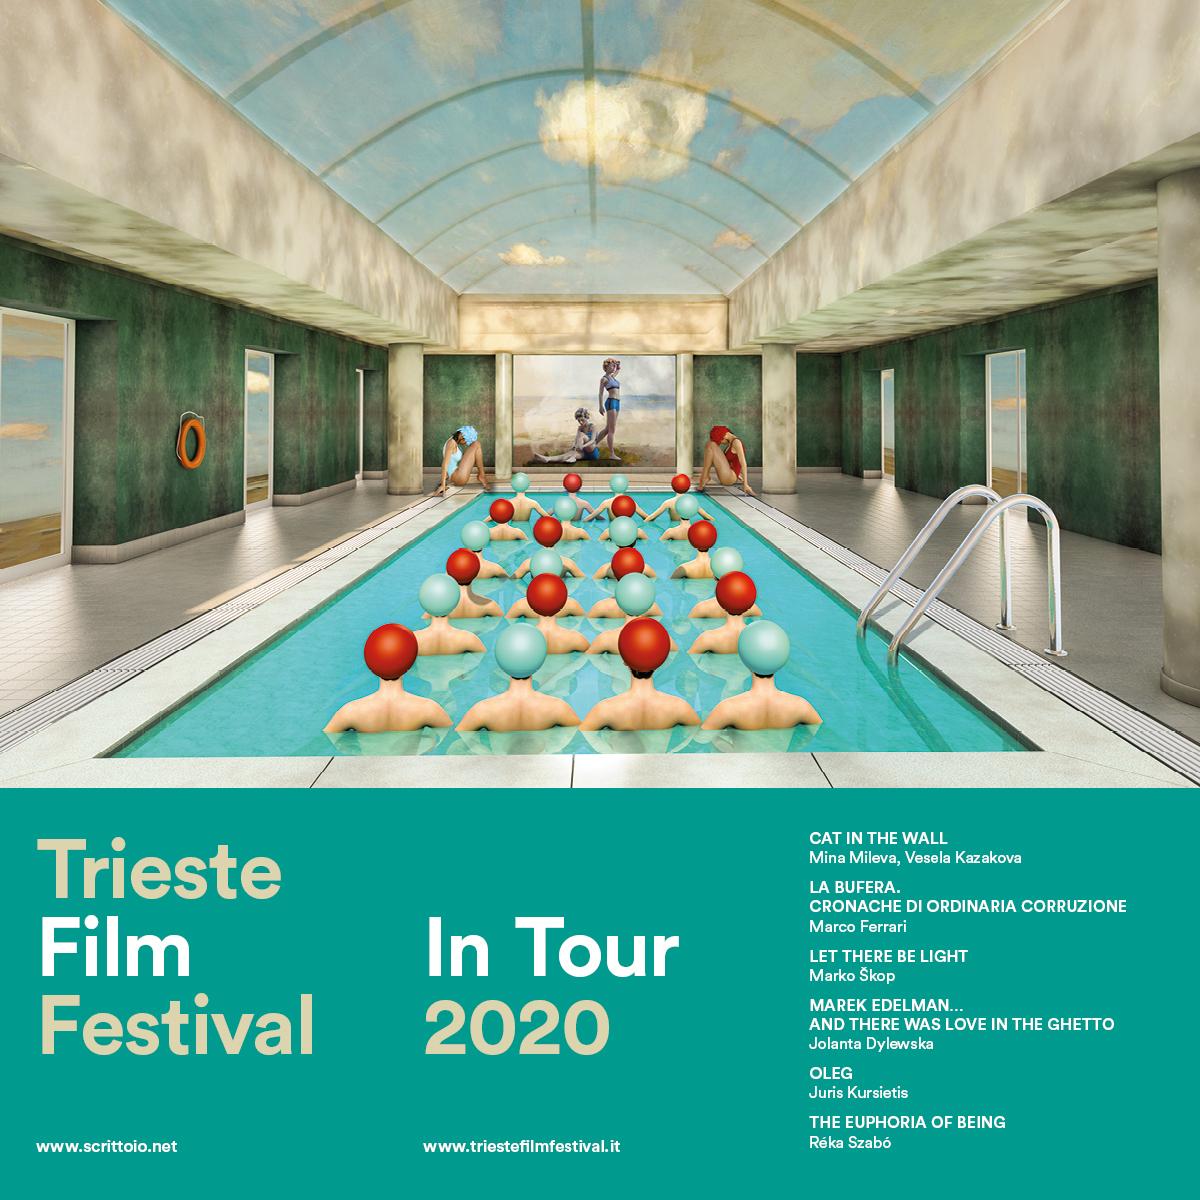 Trieste Film Festival in Tour 2020